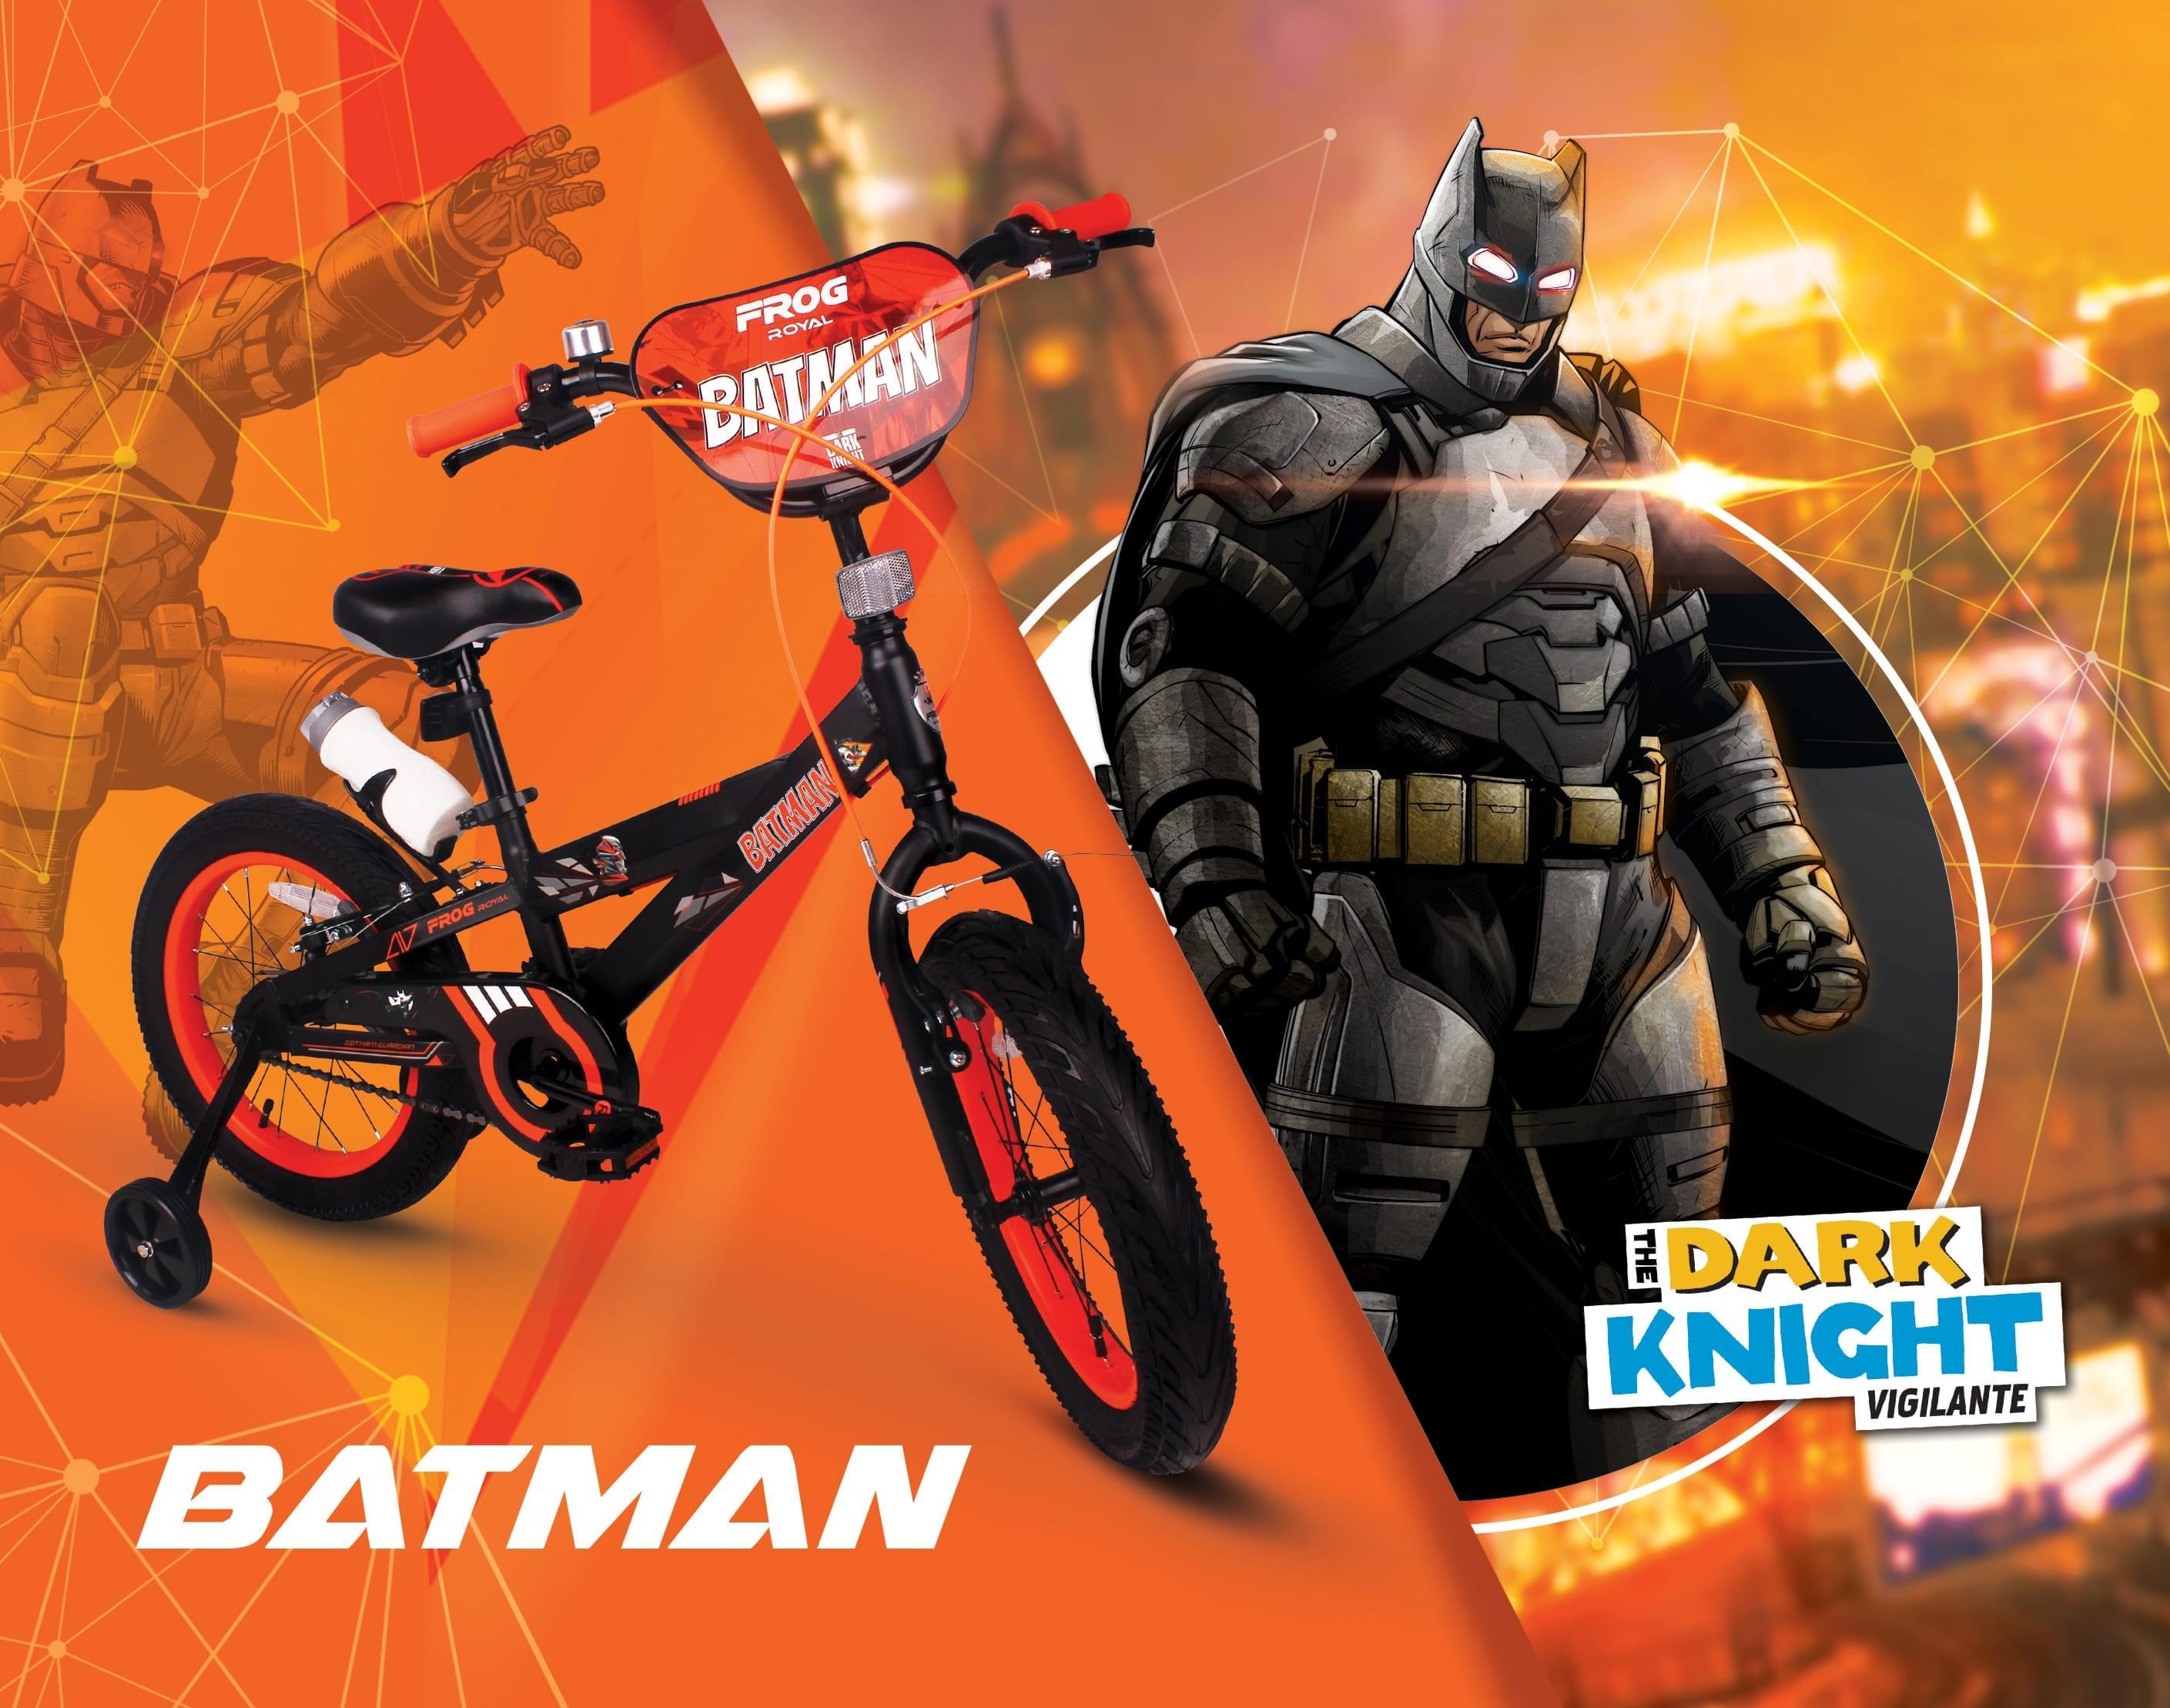 Batman 20 image 3